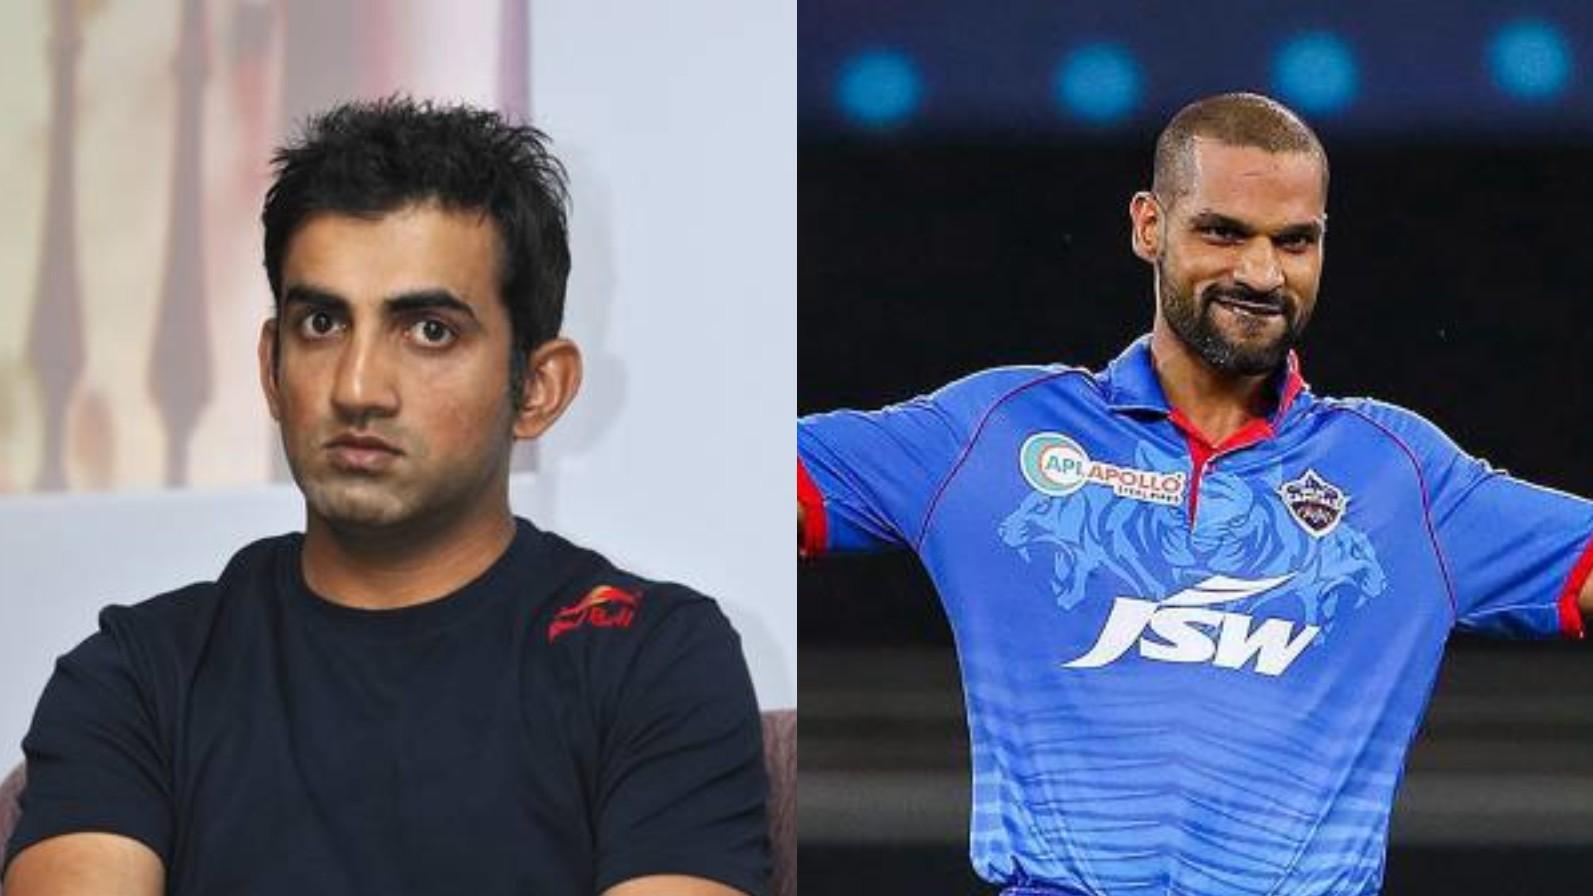 IPL 2020: Gautam Gambhir hails Shikhar Dhawan's back-to-back hundreds in IPL